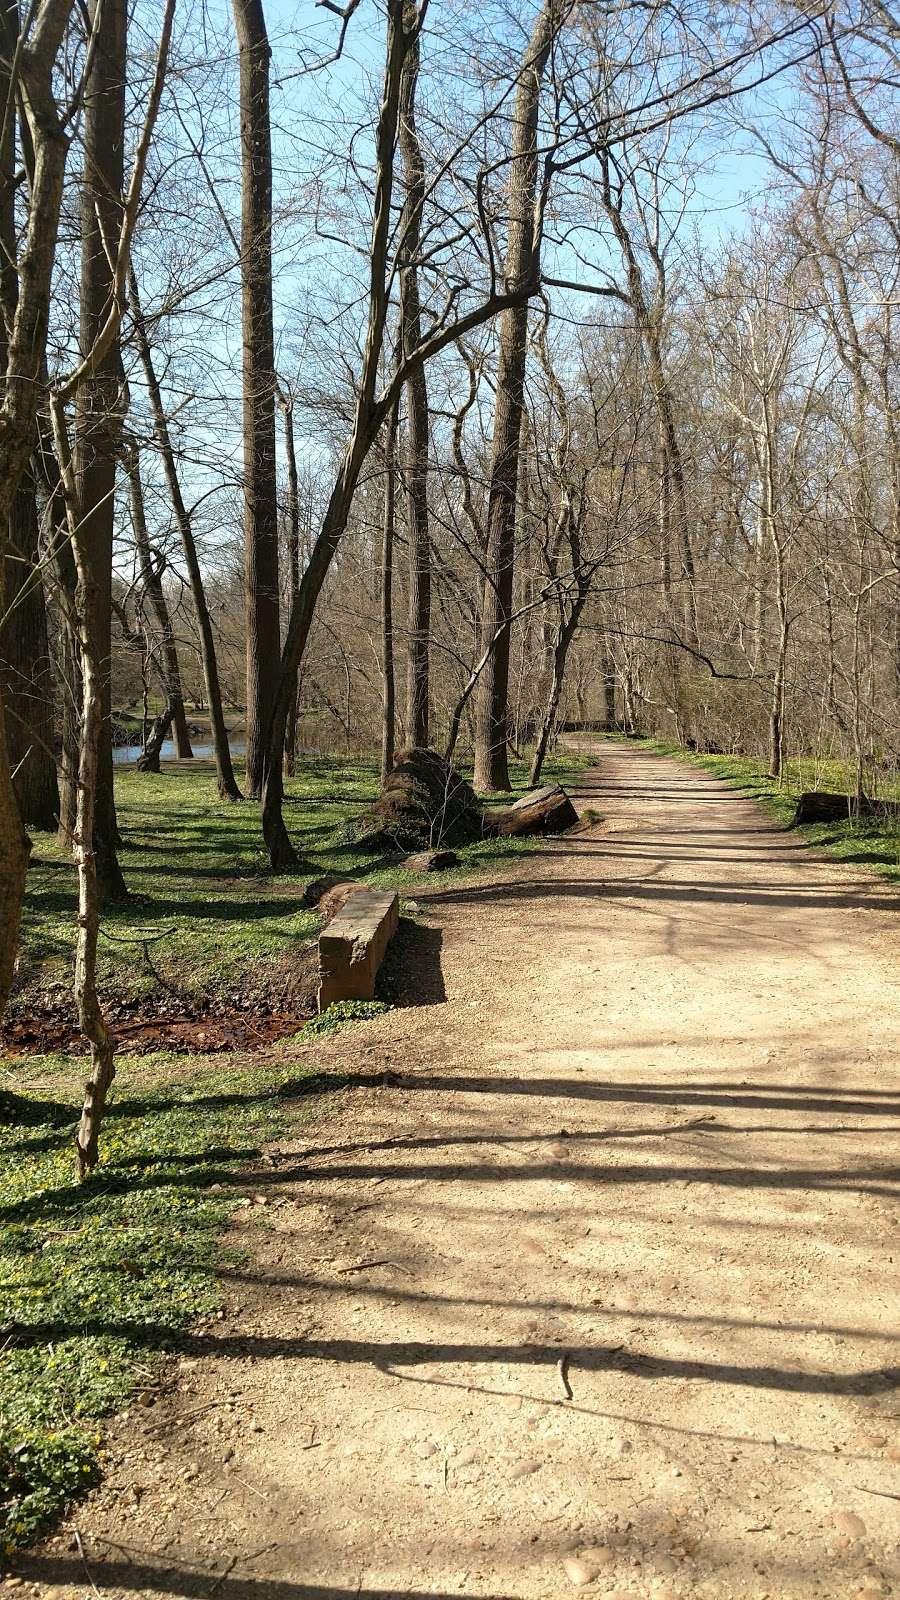 Rock Creek Trail - park  | Photo 3 of 10 | Address: 1730 Juniper St NW, Washington, DC 20012, USA | Phone: (202) 619-7023